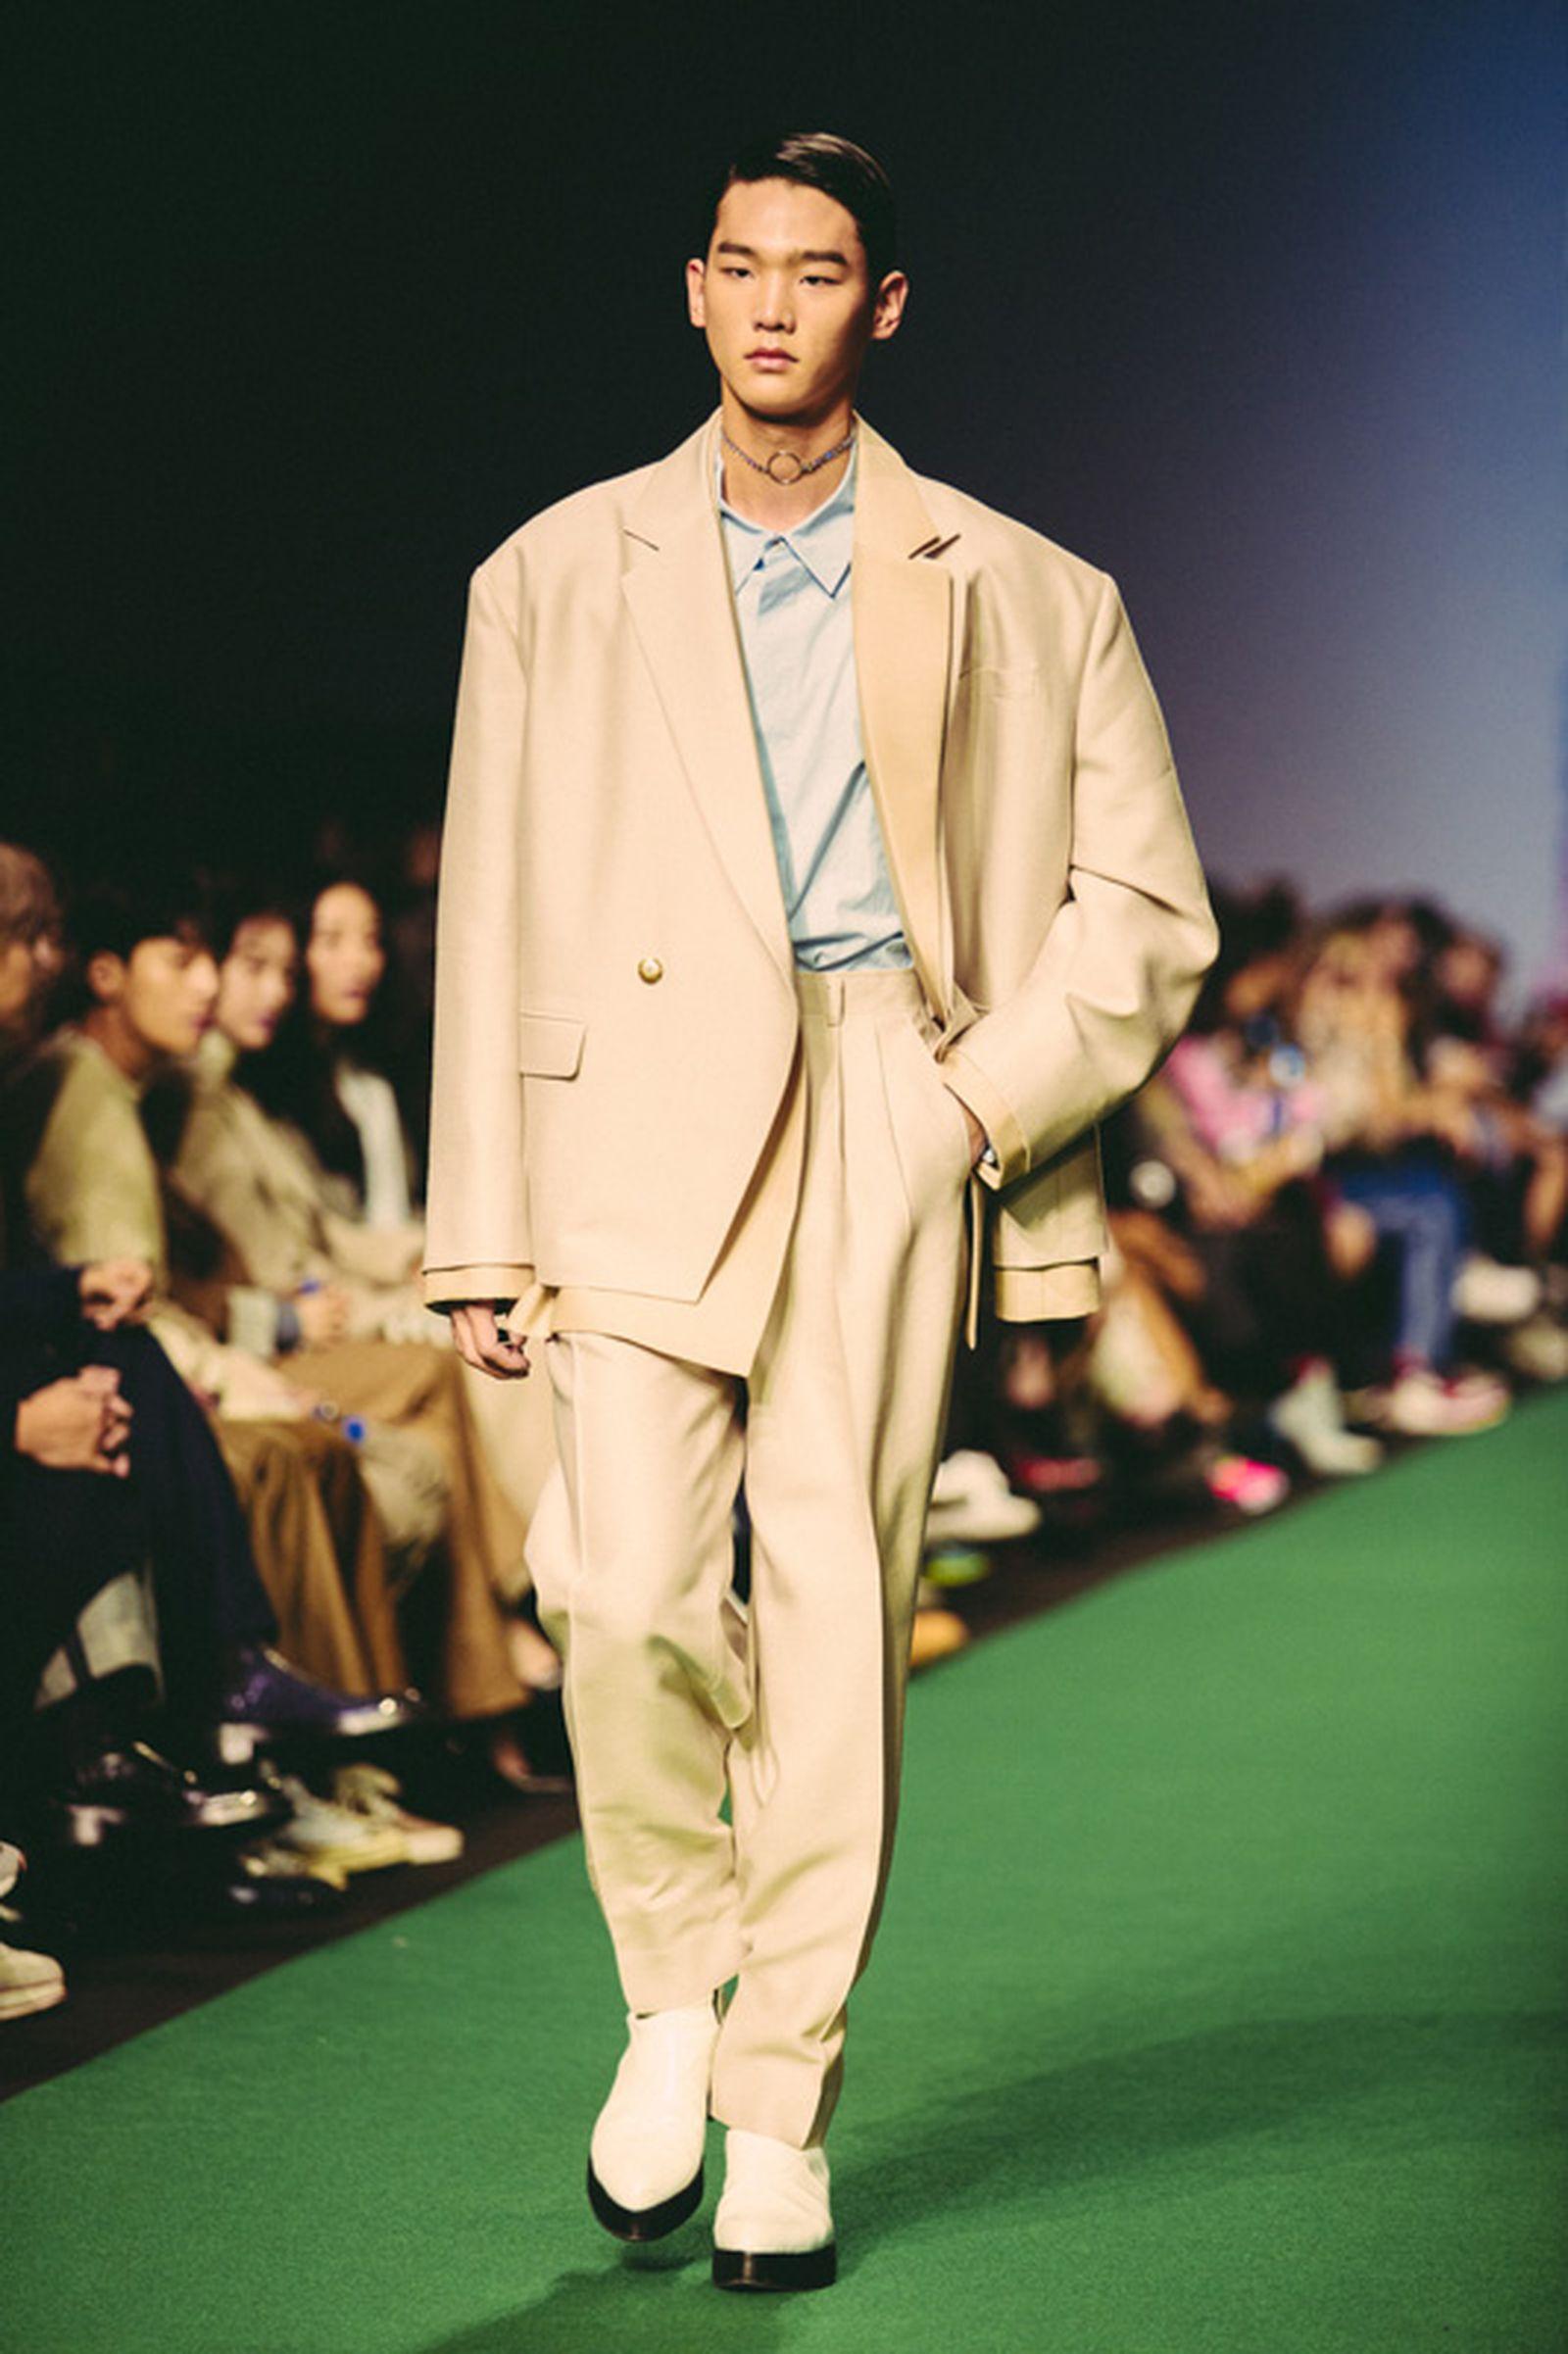 Seoul Fashion Week Ordinary People